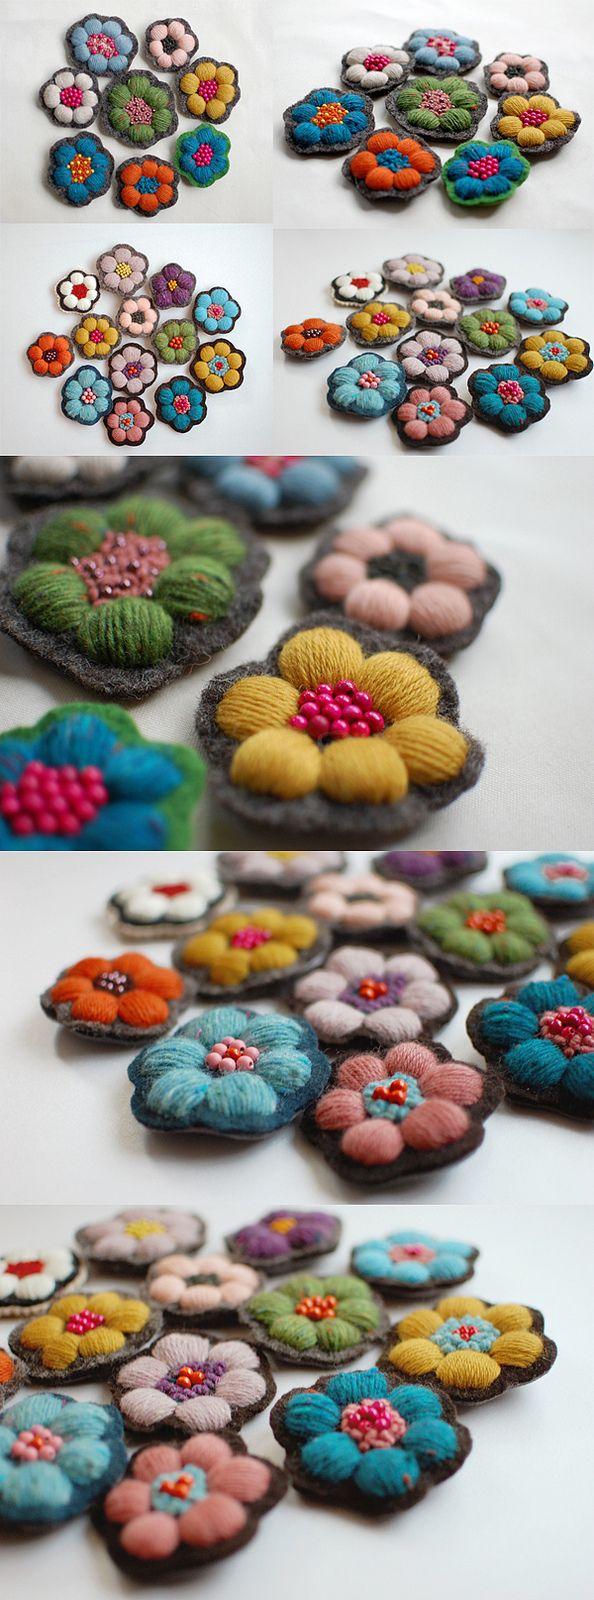 flowers brooch; tinytoadstool by shan shan